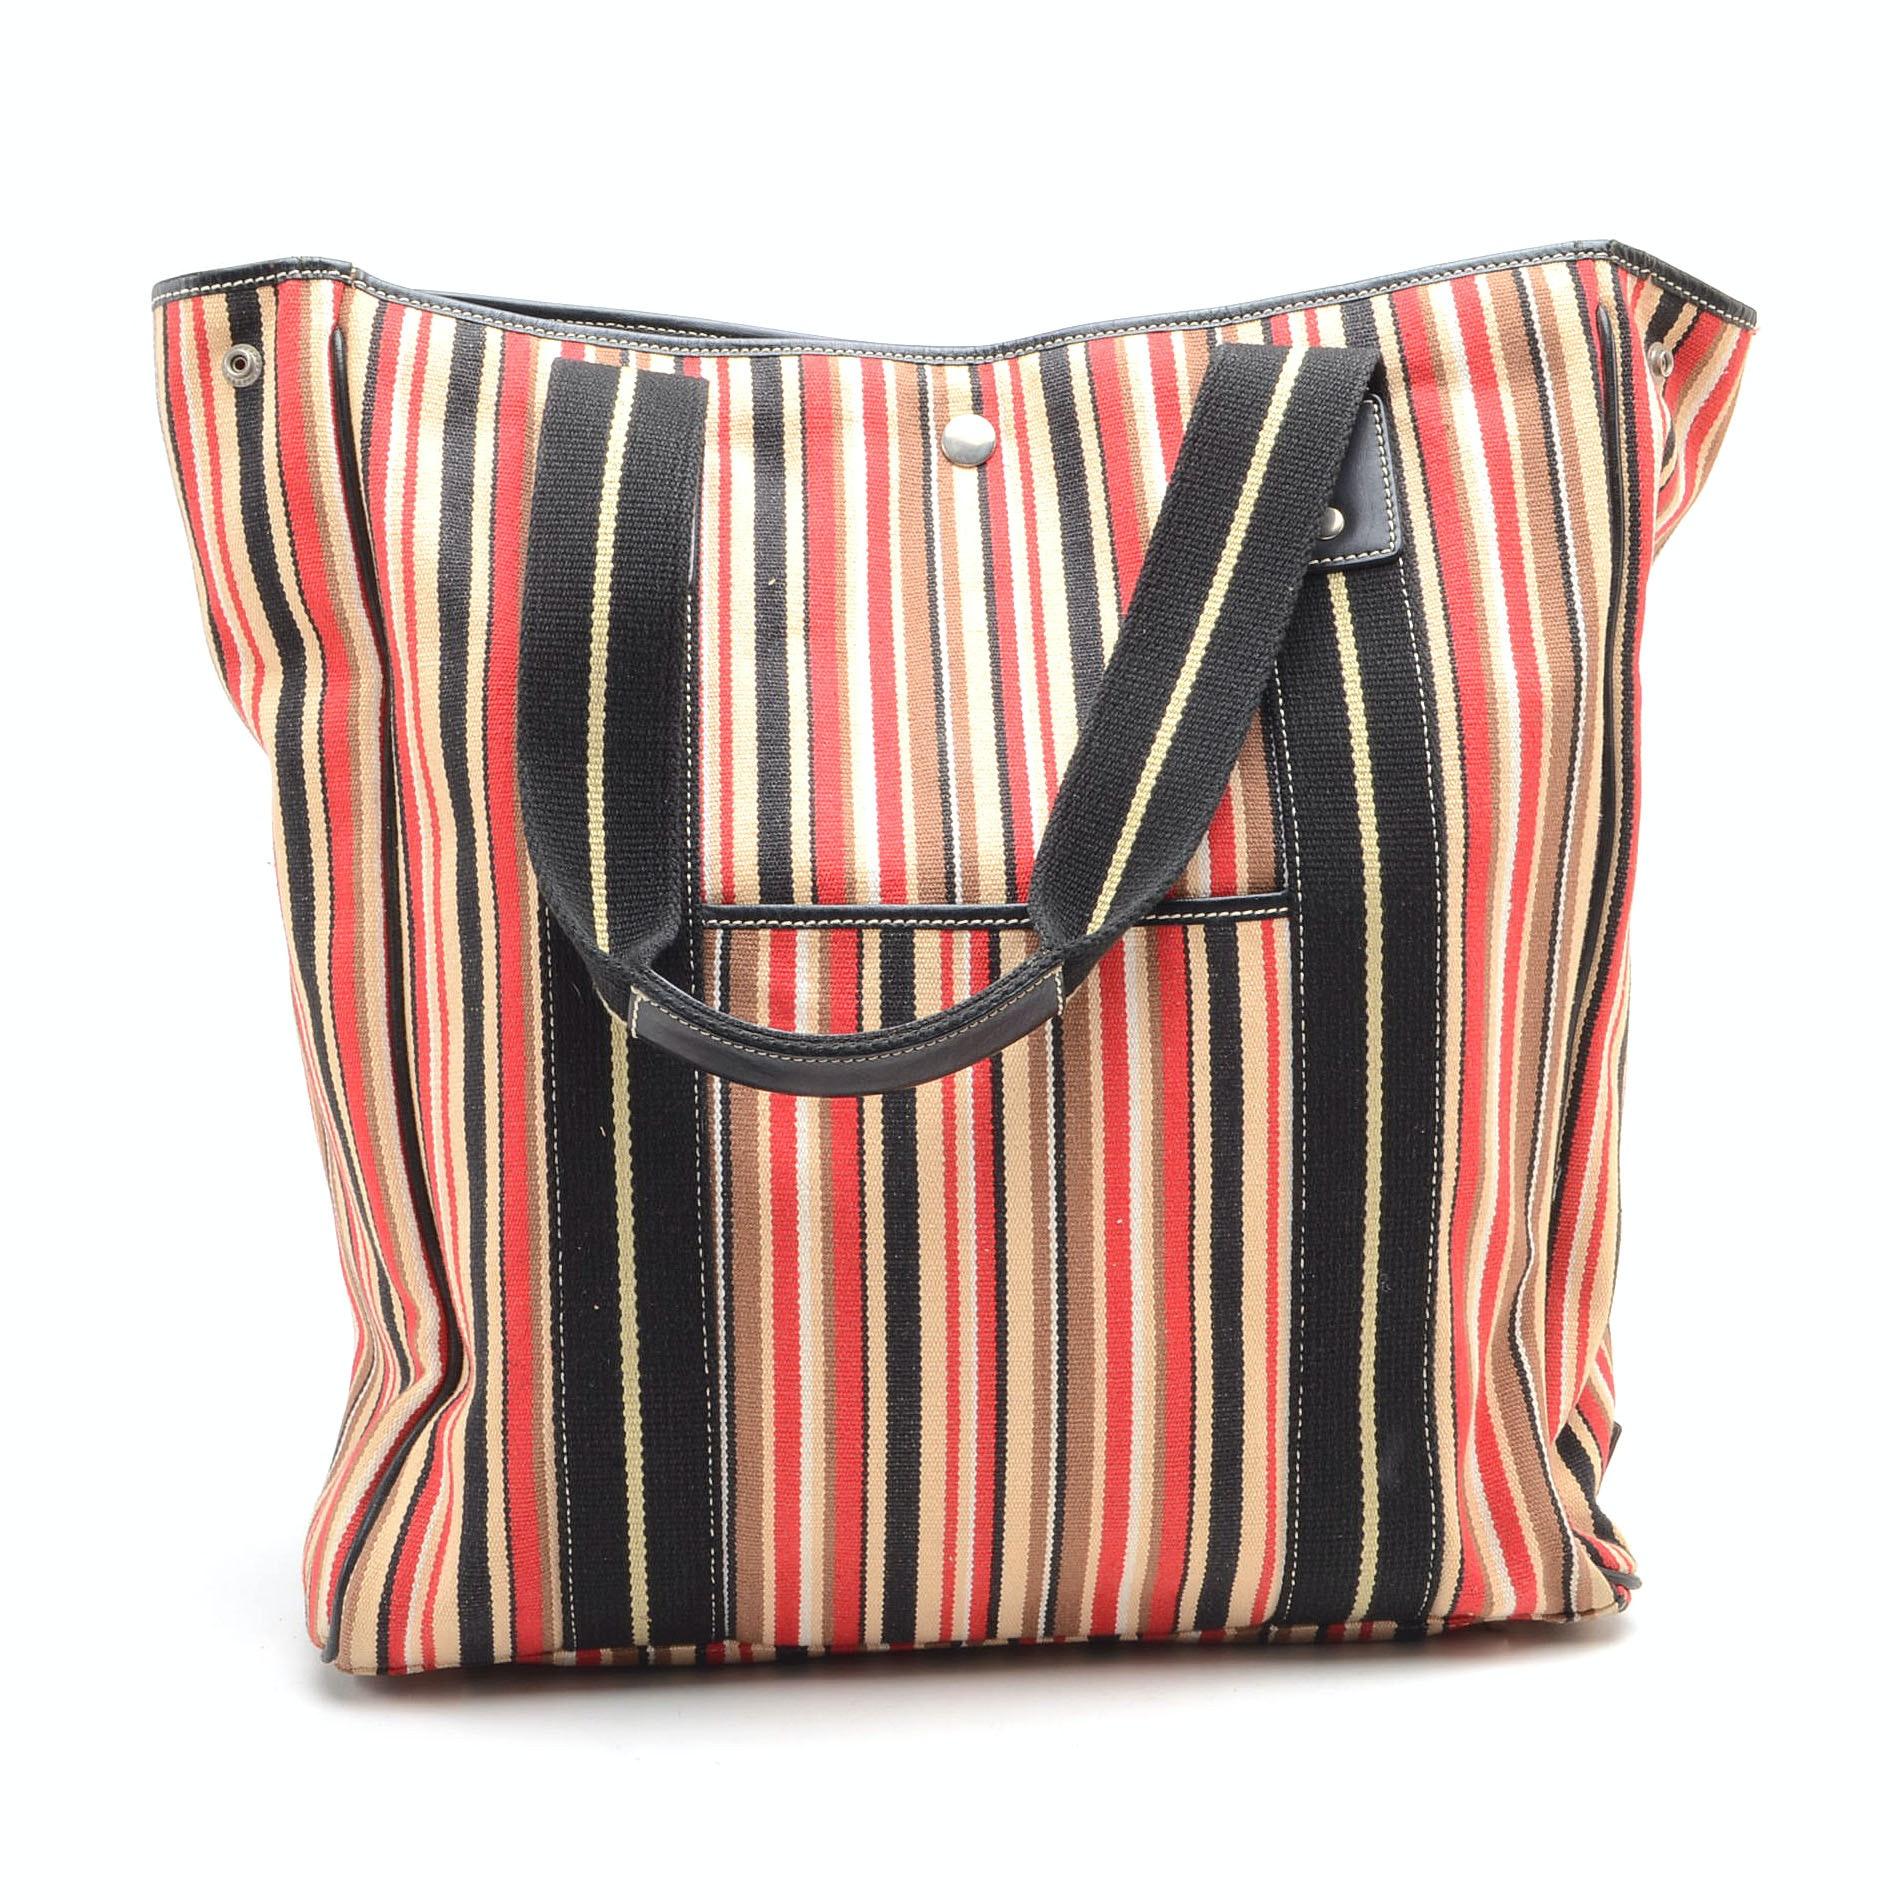 Striped Tote Bag by Rafè of New York